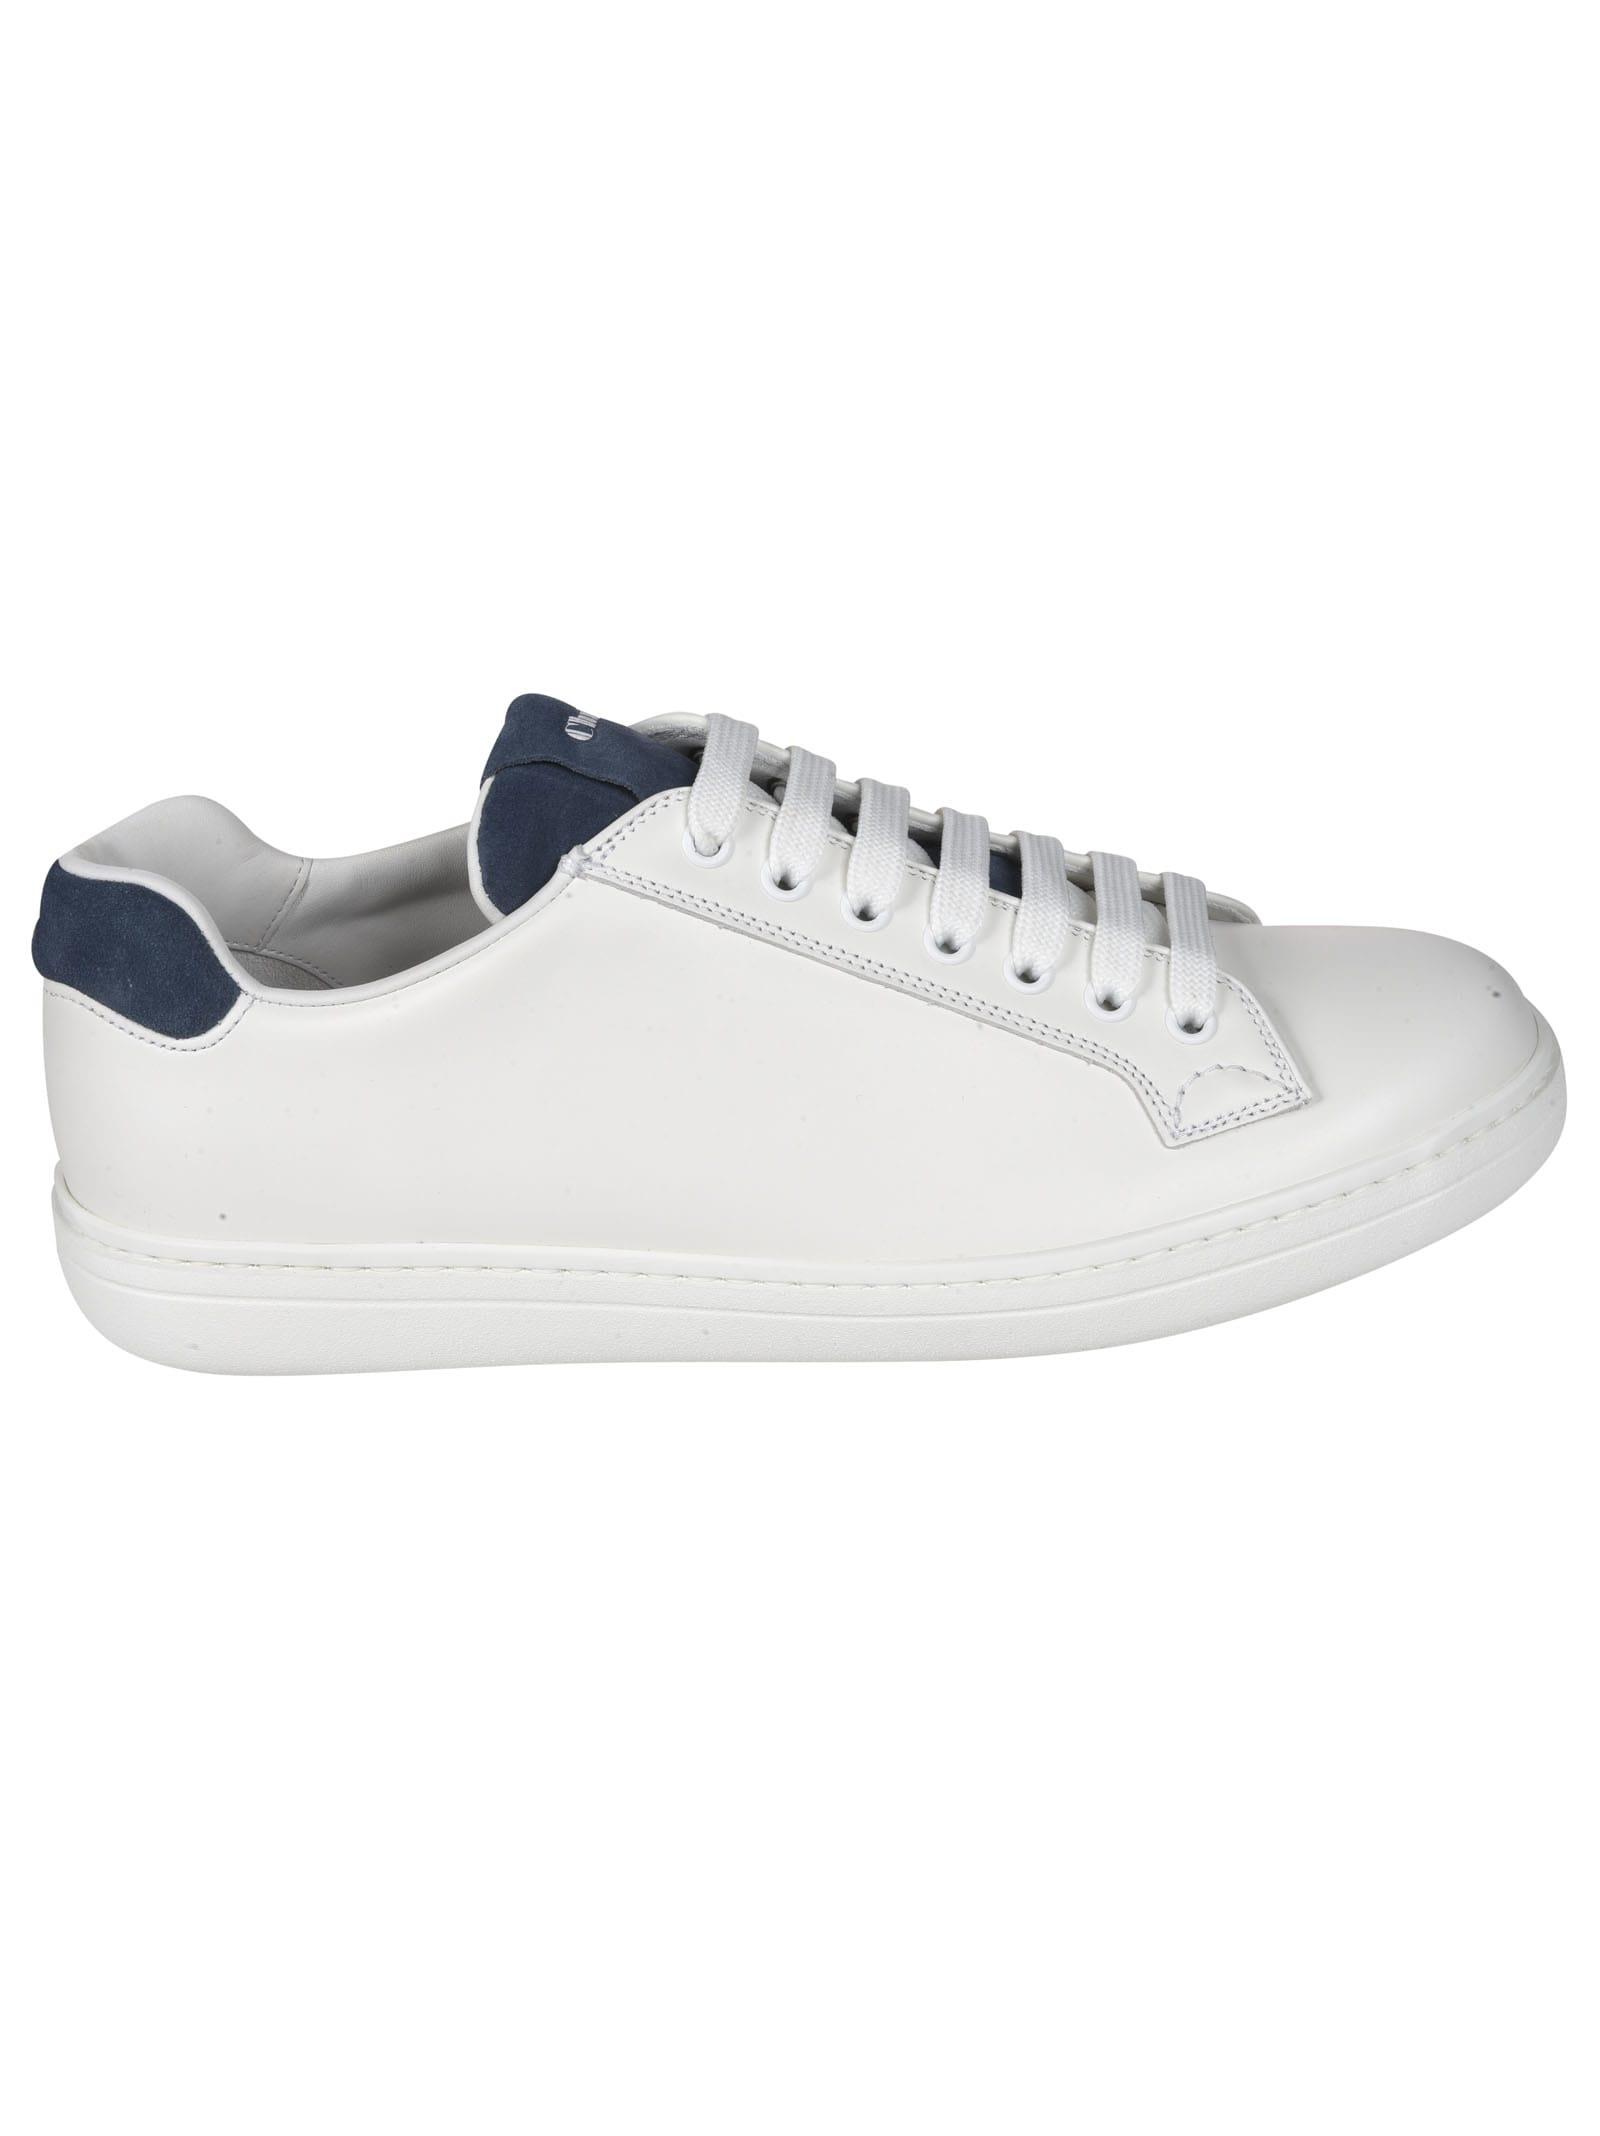 Churchs Boland Plus 2 Sneakers